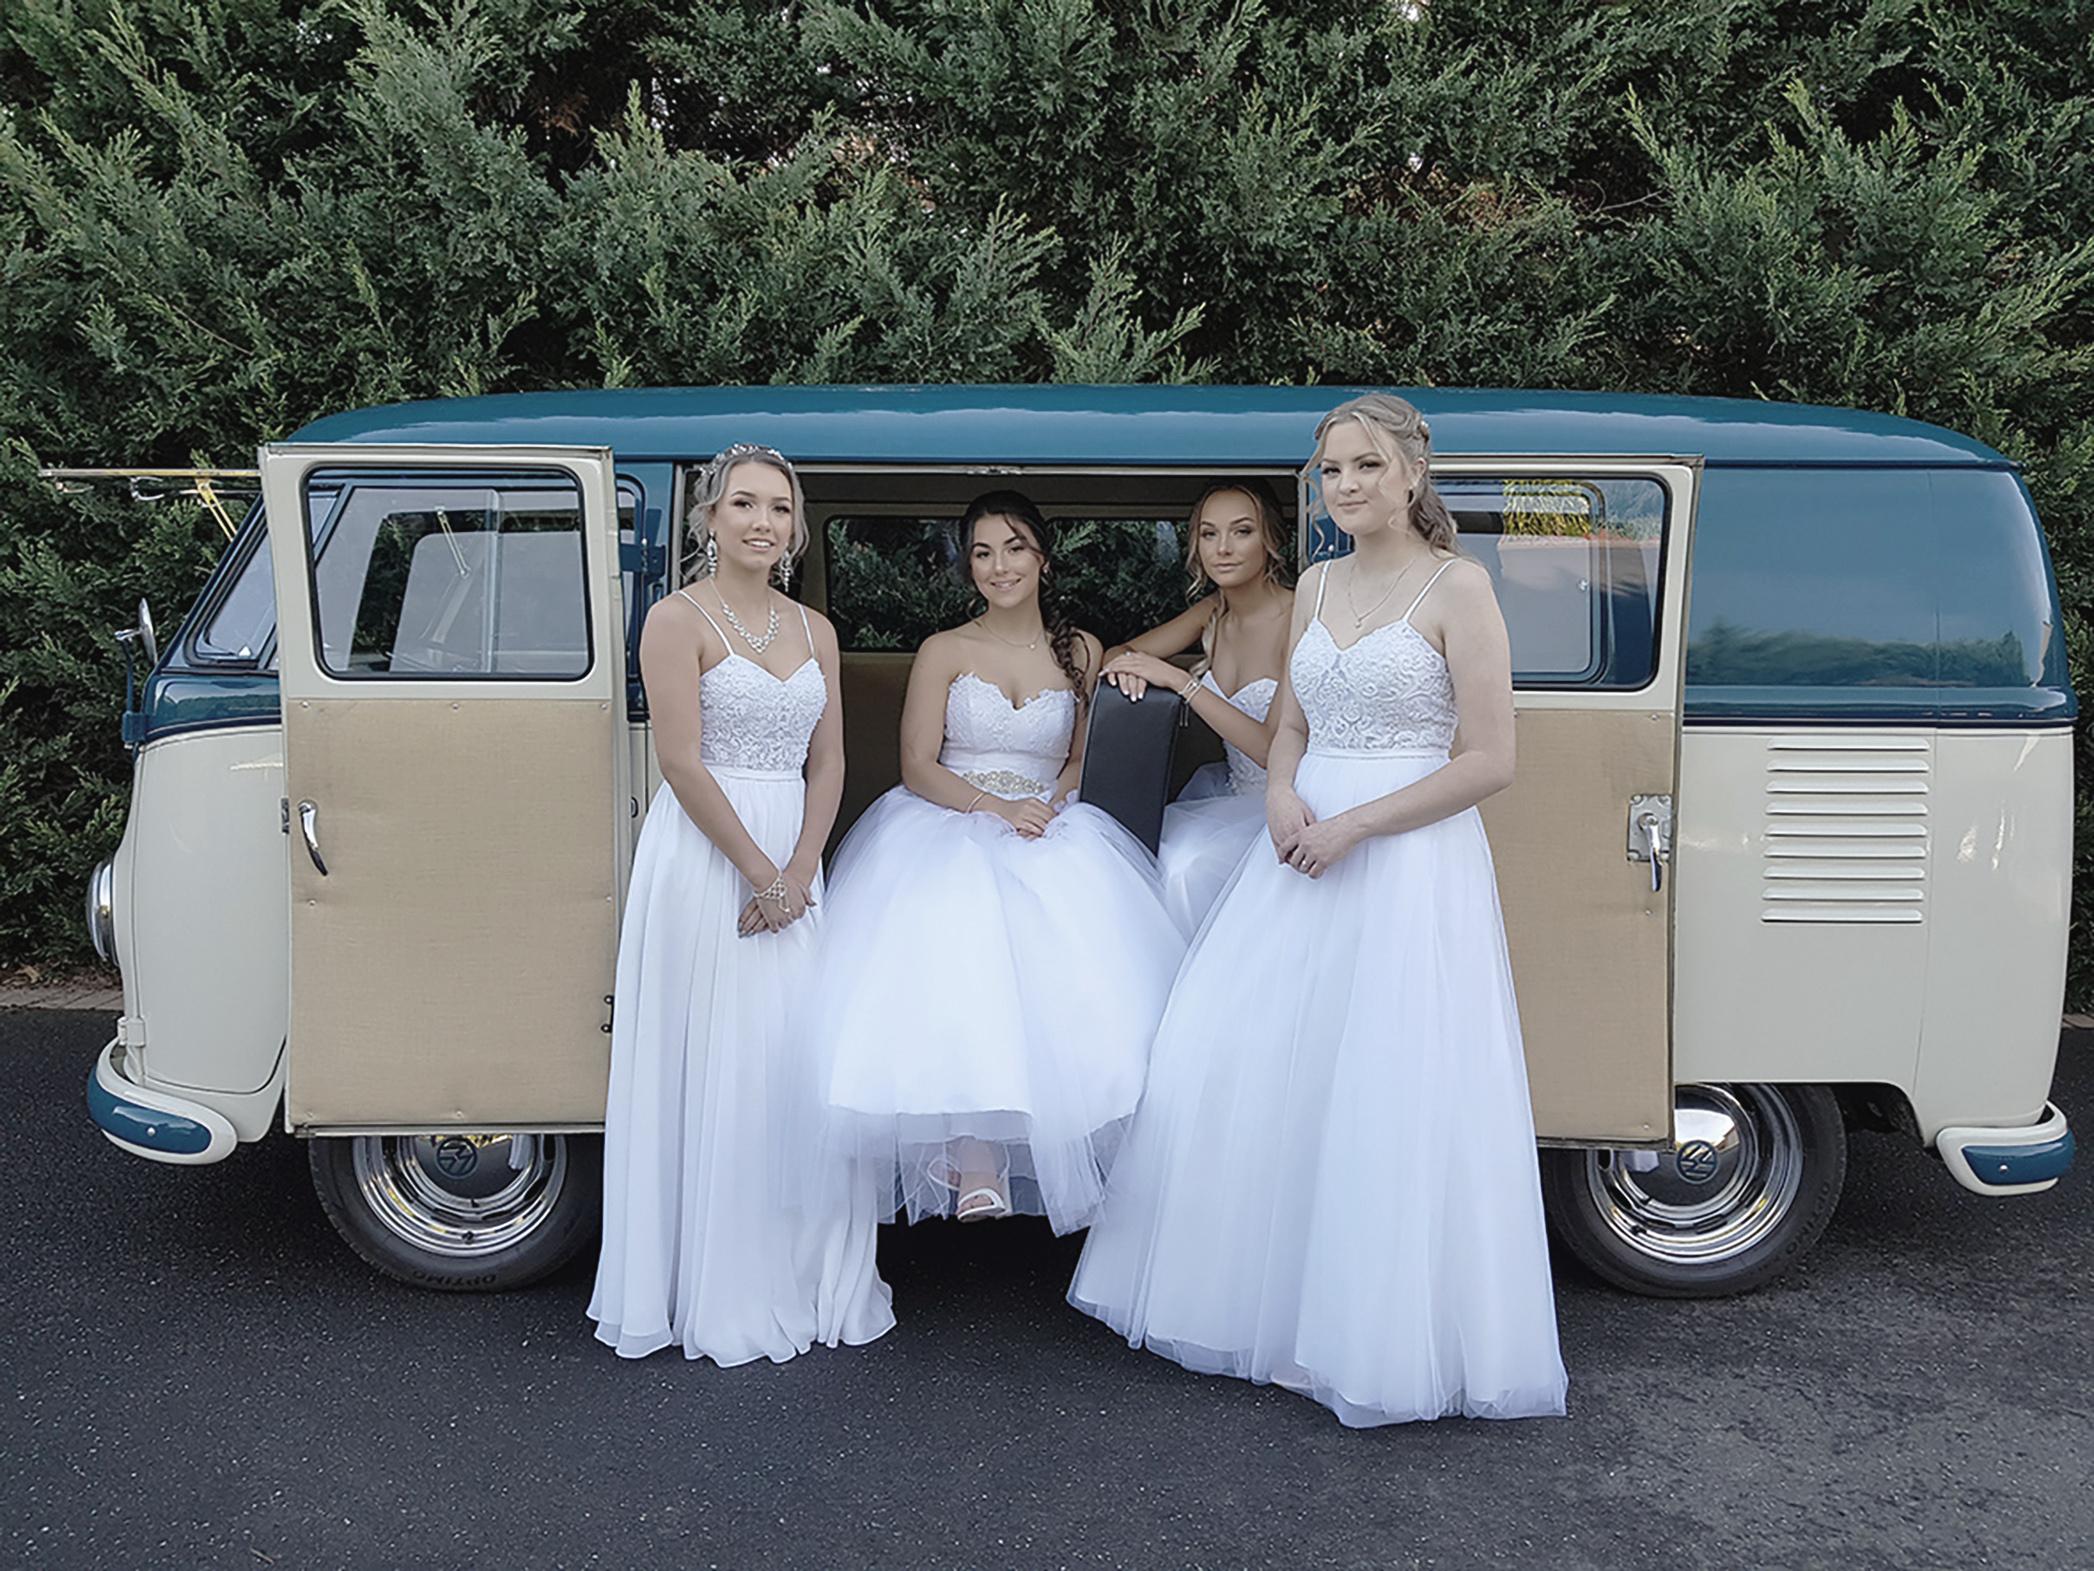 Casey Grammer Debutante Ball - Photo's by Kombi & Beetle Wedding & Debutante Car Hire (29)